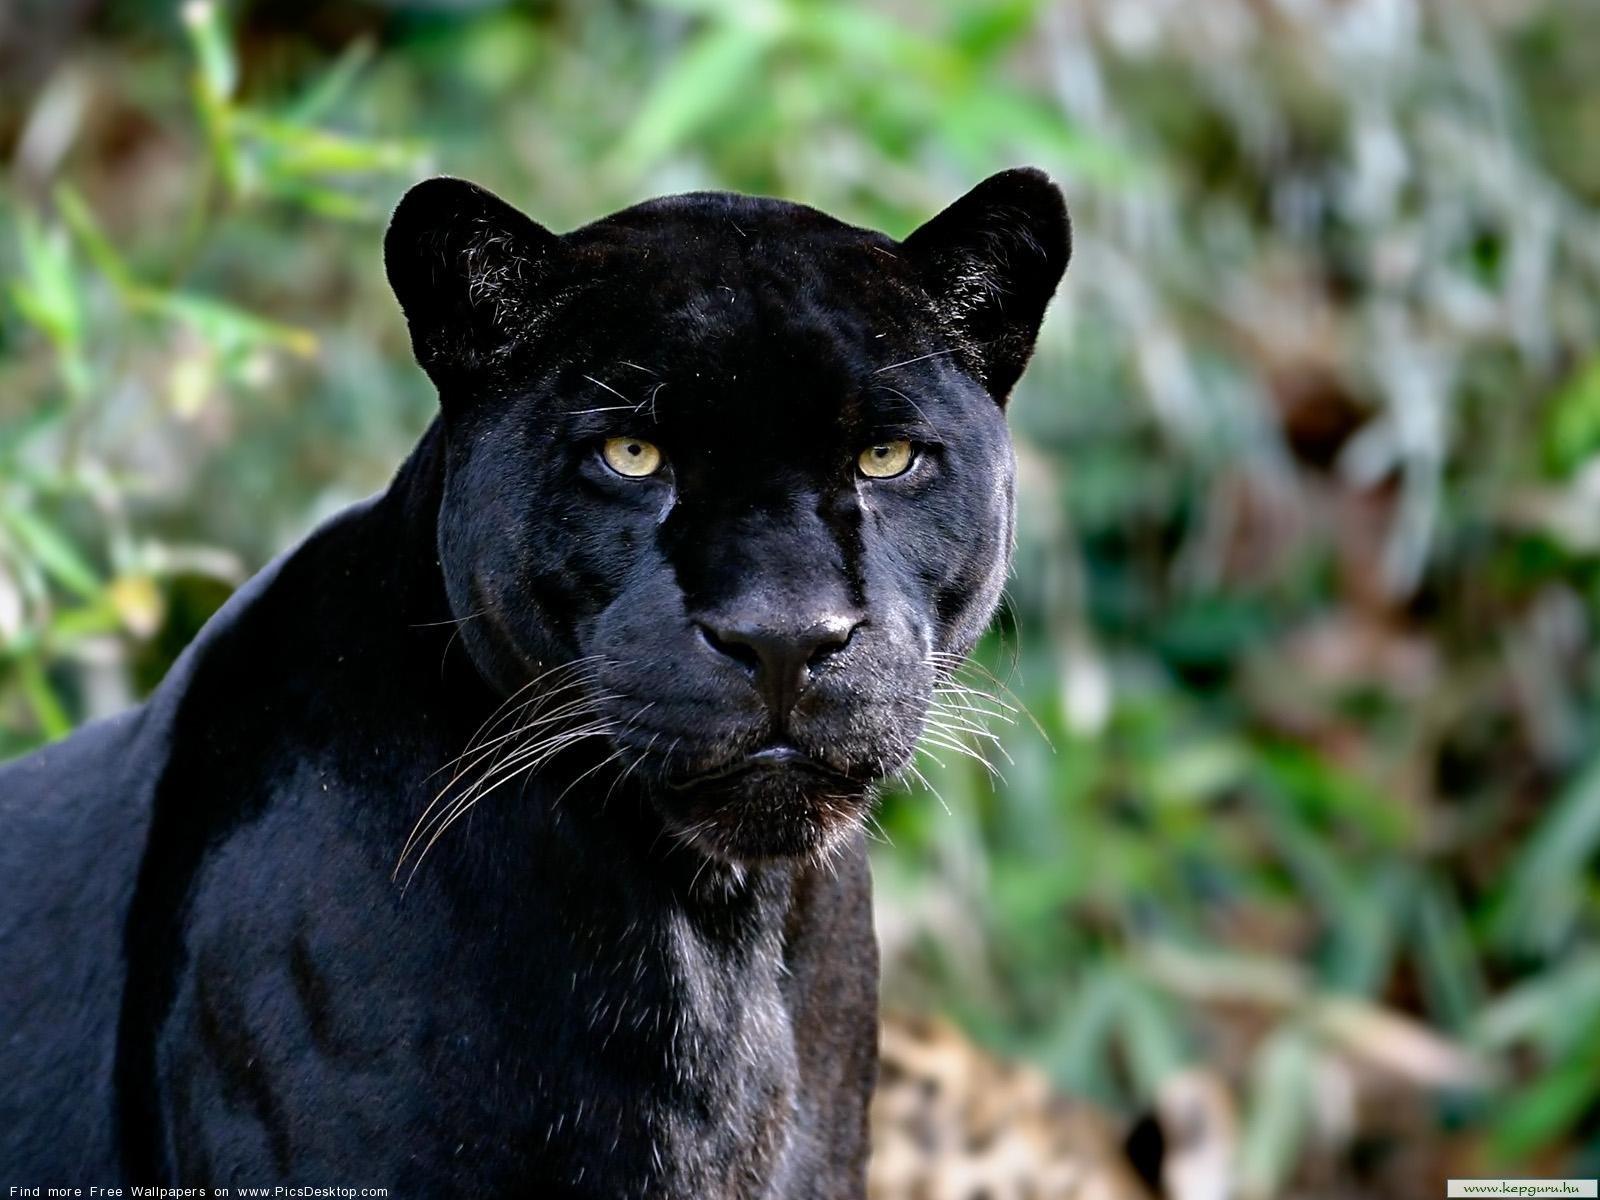 Black panther   Wild Animals   Desktop Wallpaper picture 46 1600x1200